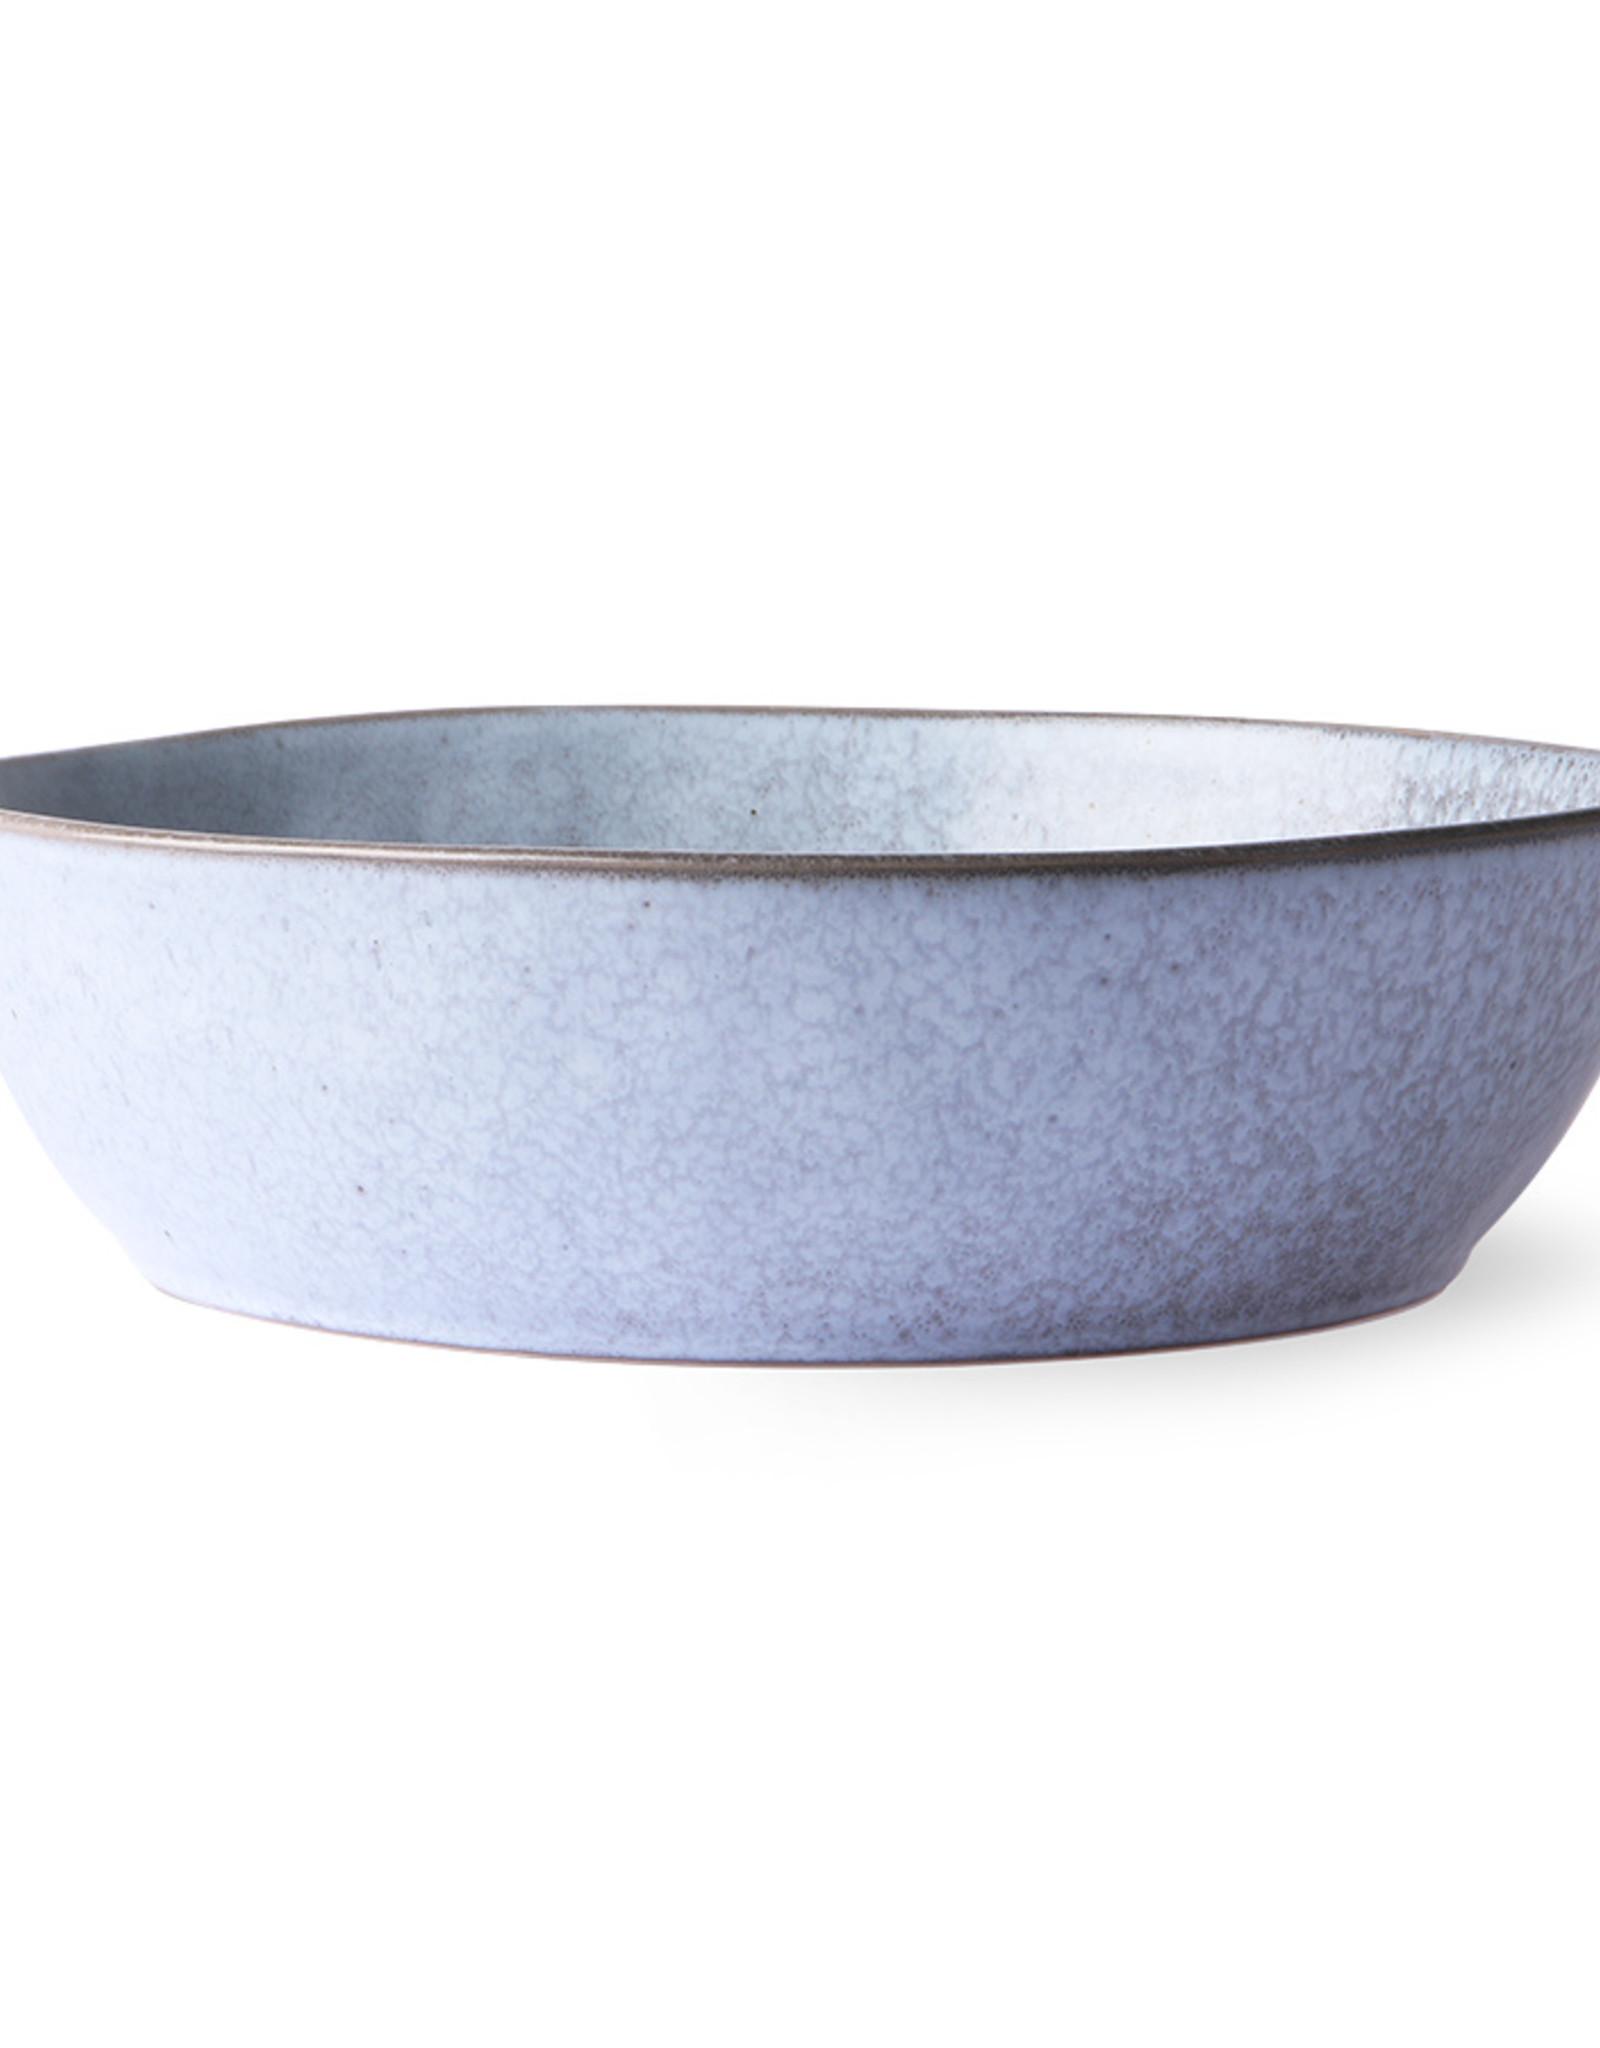 HK living Bold & Basic ceramic: rustic grey bowl L